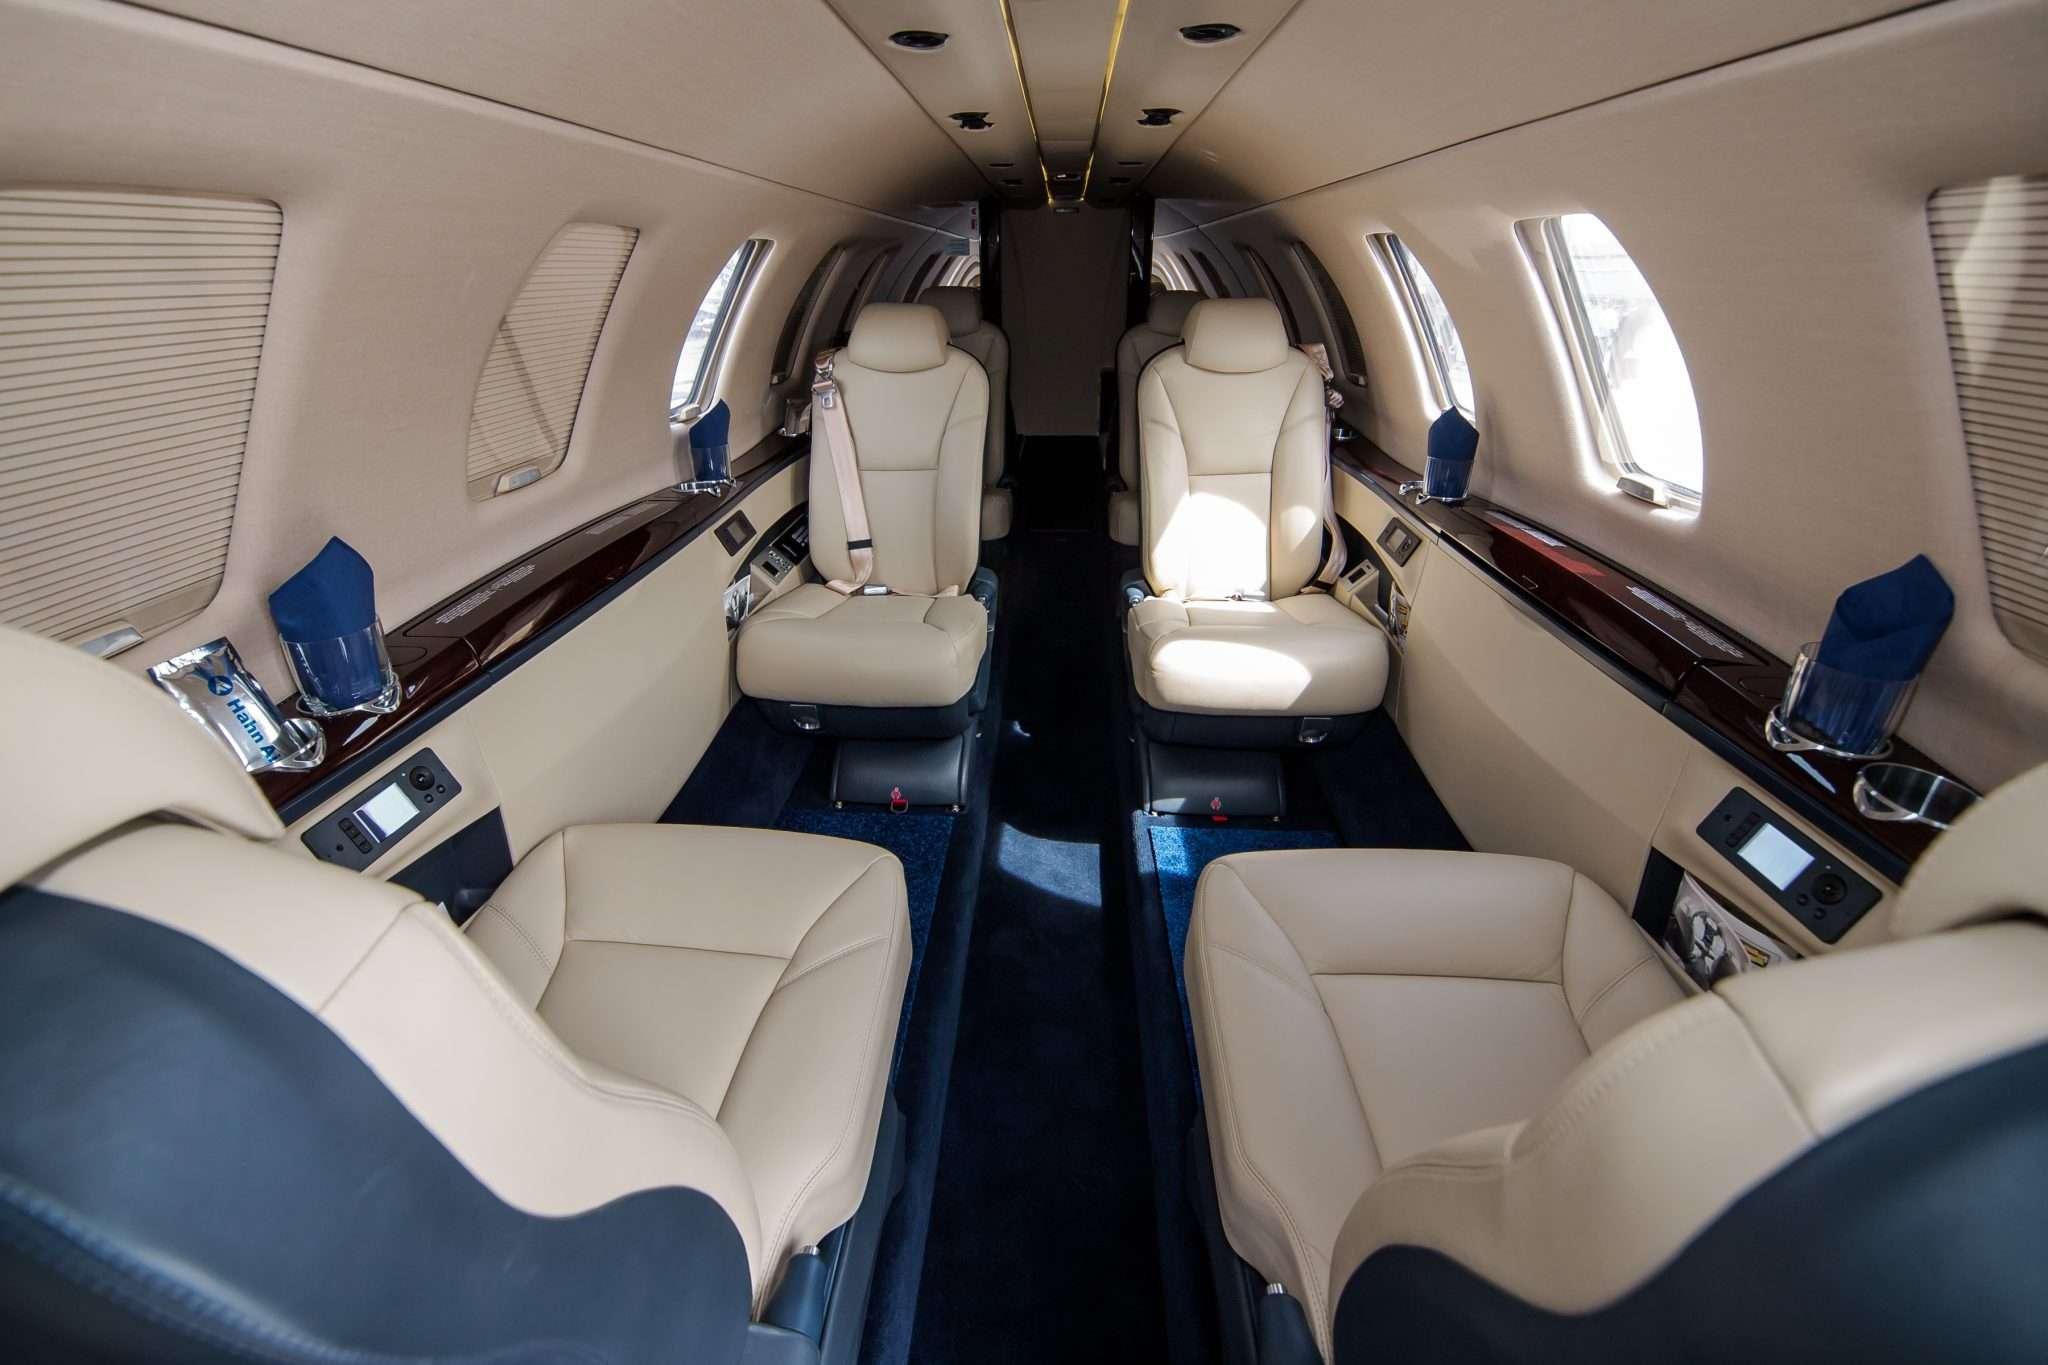 Citation Cj4 Private Jet Charter Stratos Jet Charters